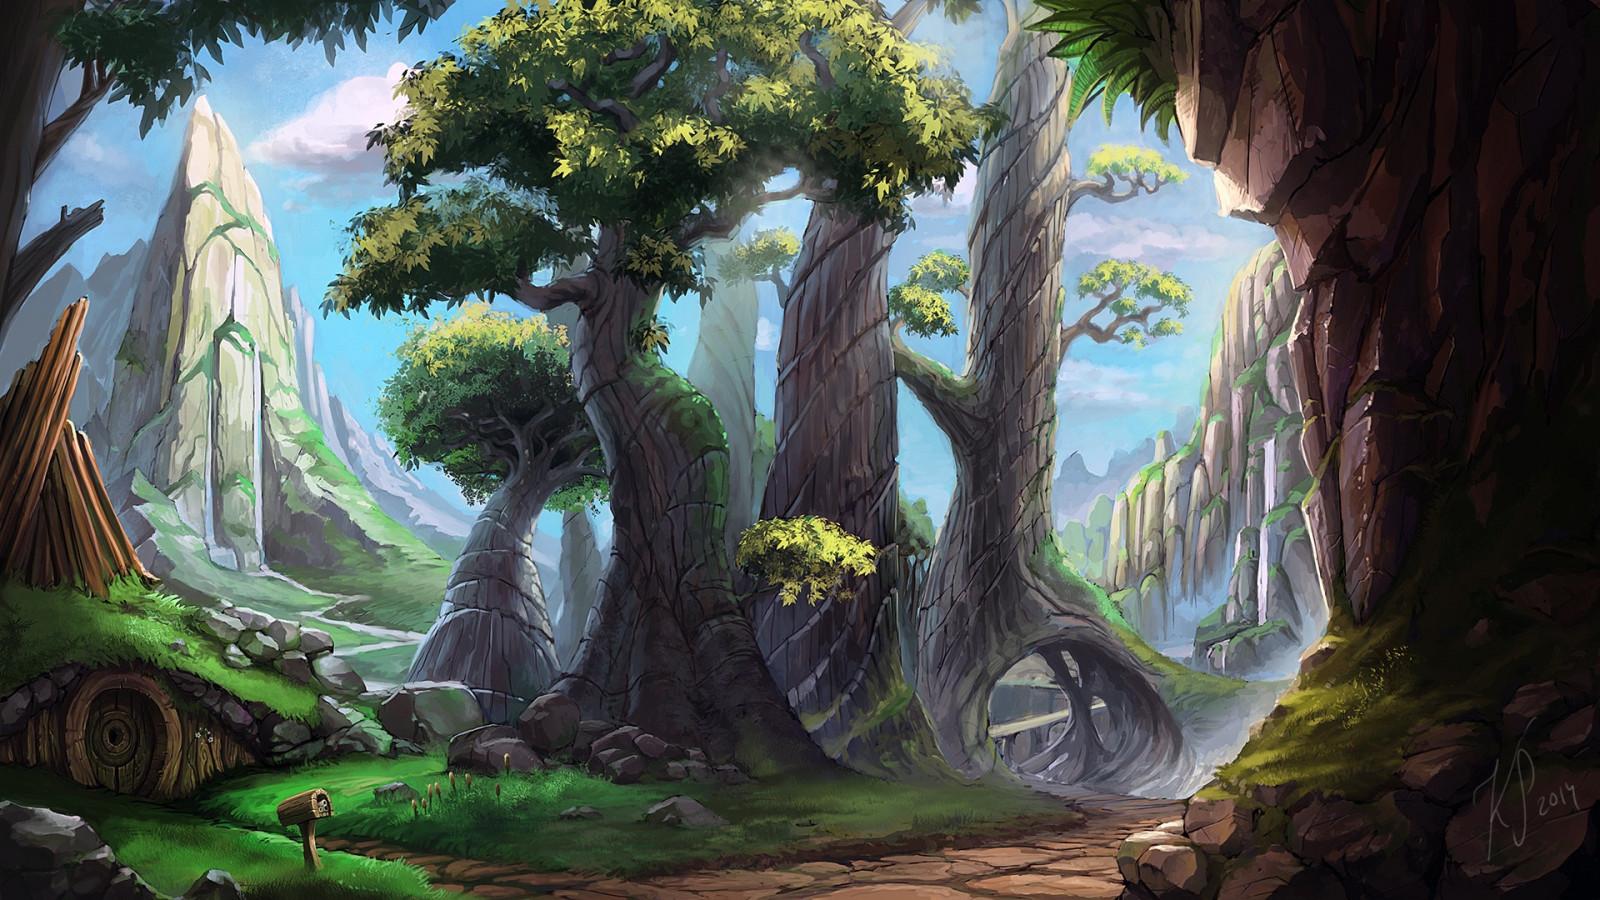 Wallpaper Trees Landscape Drawing Painting Forest Digital Art Fantasy Art Nature Deviantart Jungle Swamp Rainforest Tree Screenshot Habitat Natural Environment Ecosystem 1920x1080 Mrguada 232378 Hd Wallpapers Wallhere